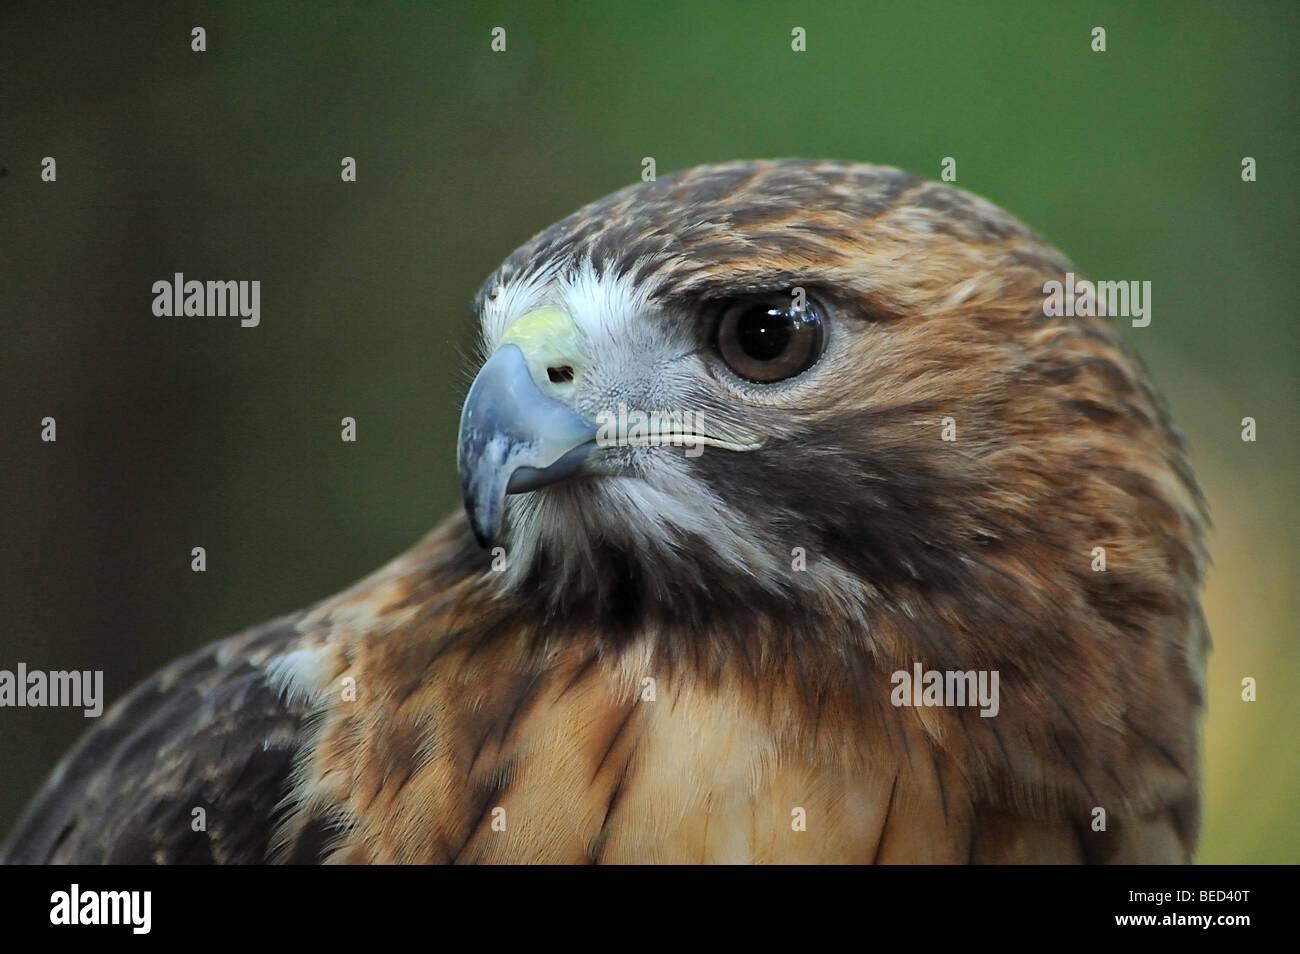 Red-tailed hawk, Buteo jamaicensis, Florida, captive - Stock Image